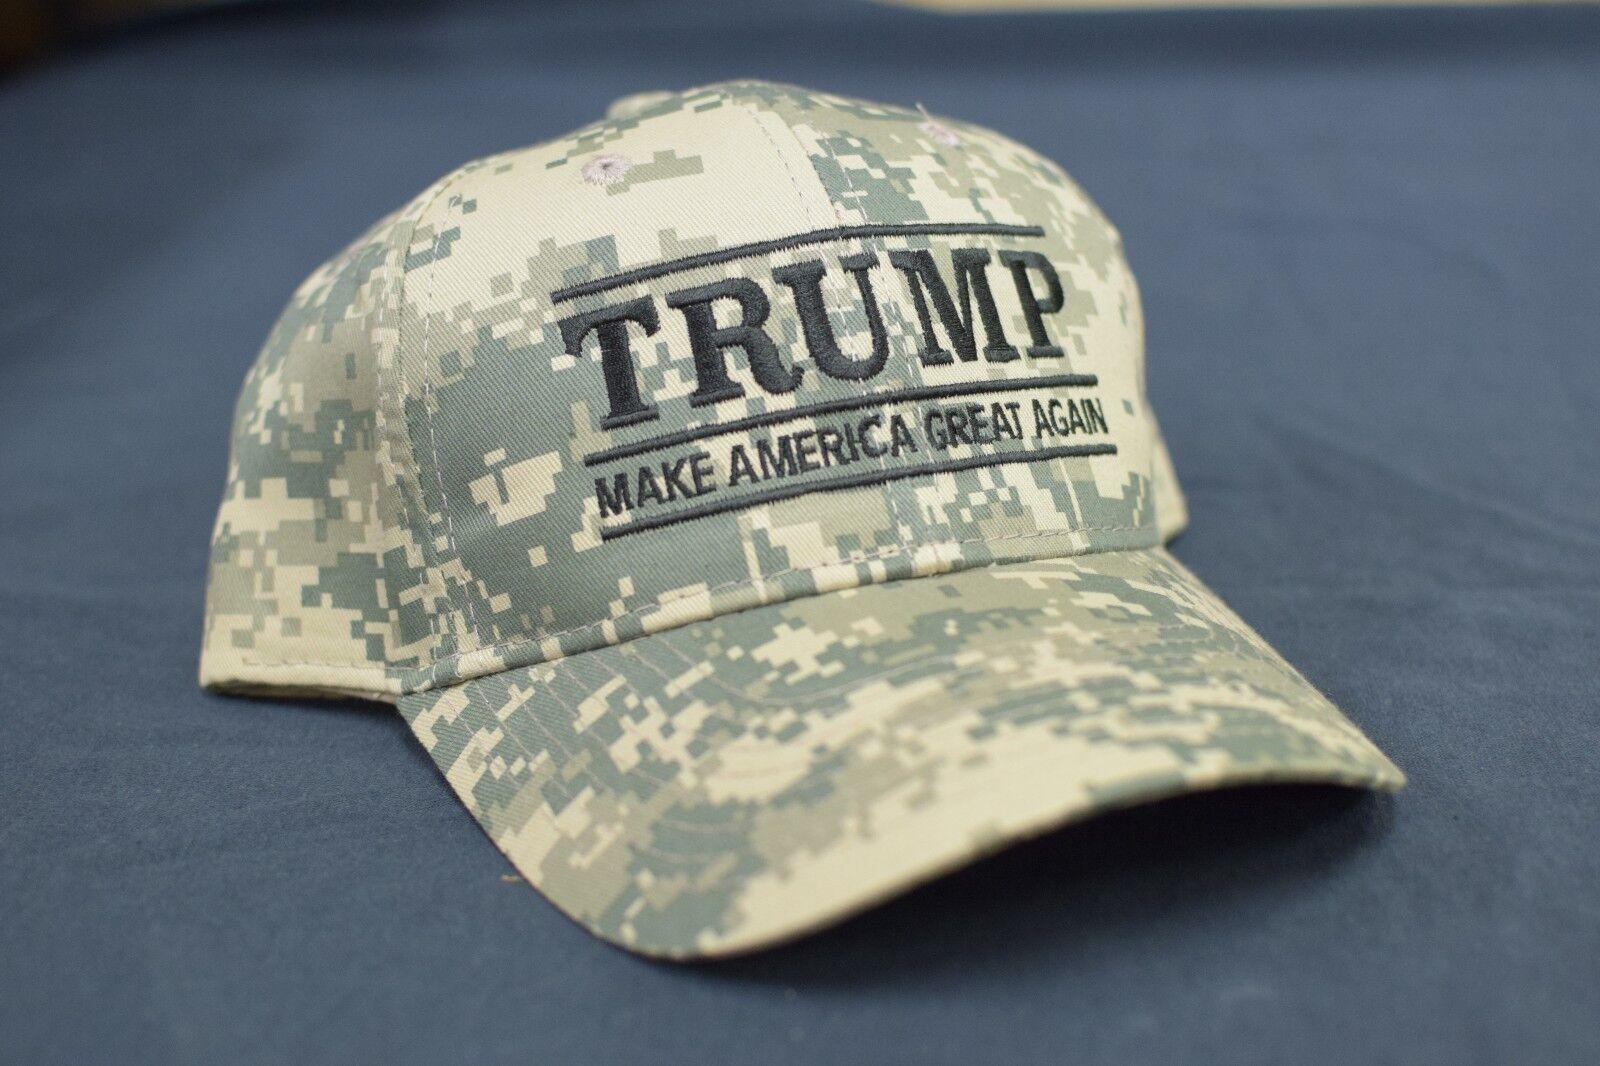 Make America Great Again -Donald Trump Hat Republican 2020- NEW Digital Camo Cap